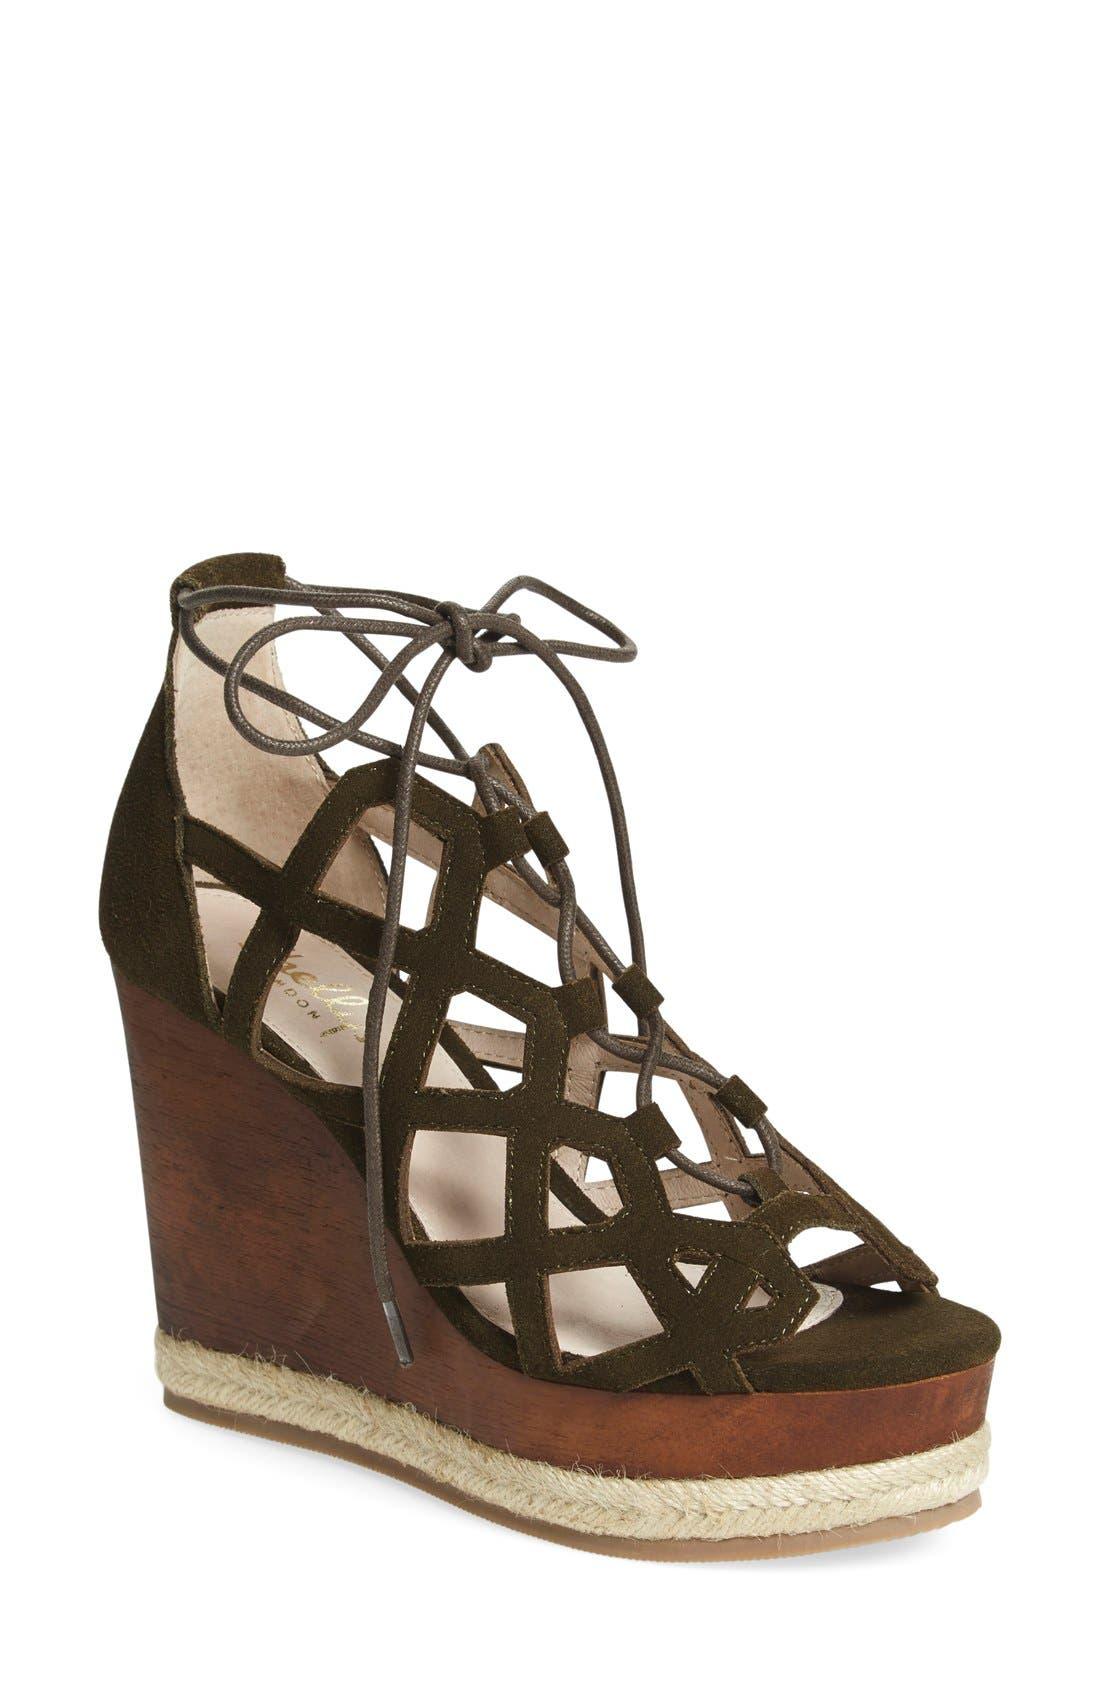 Main Image - Shellys London 'Emerald' Wedge Sandal (Women)